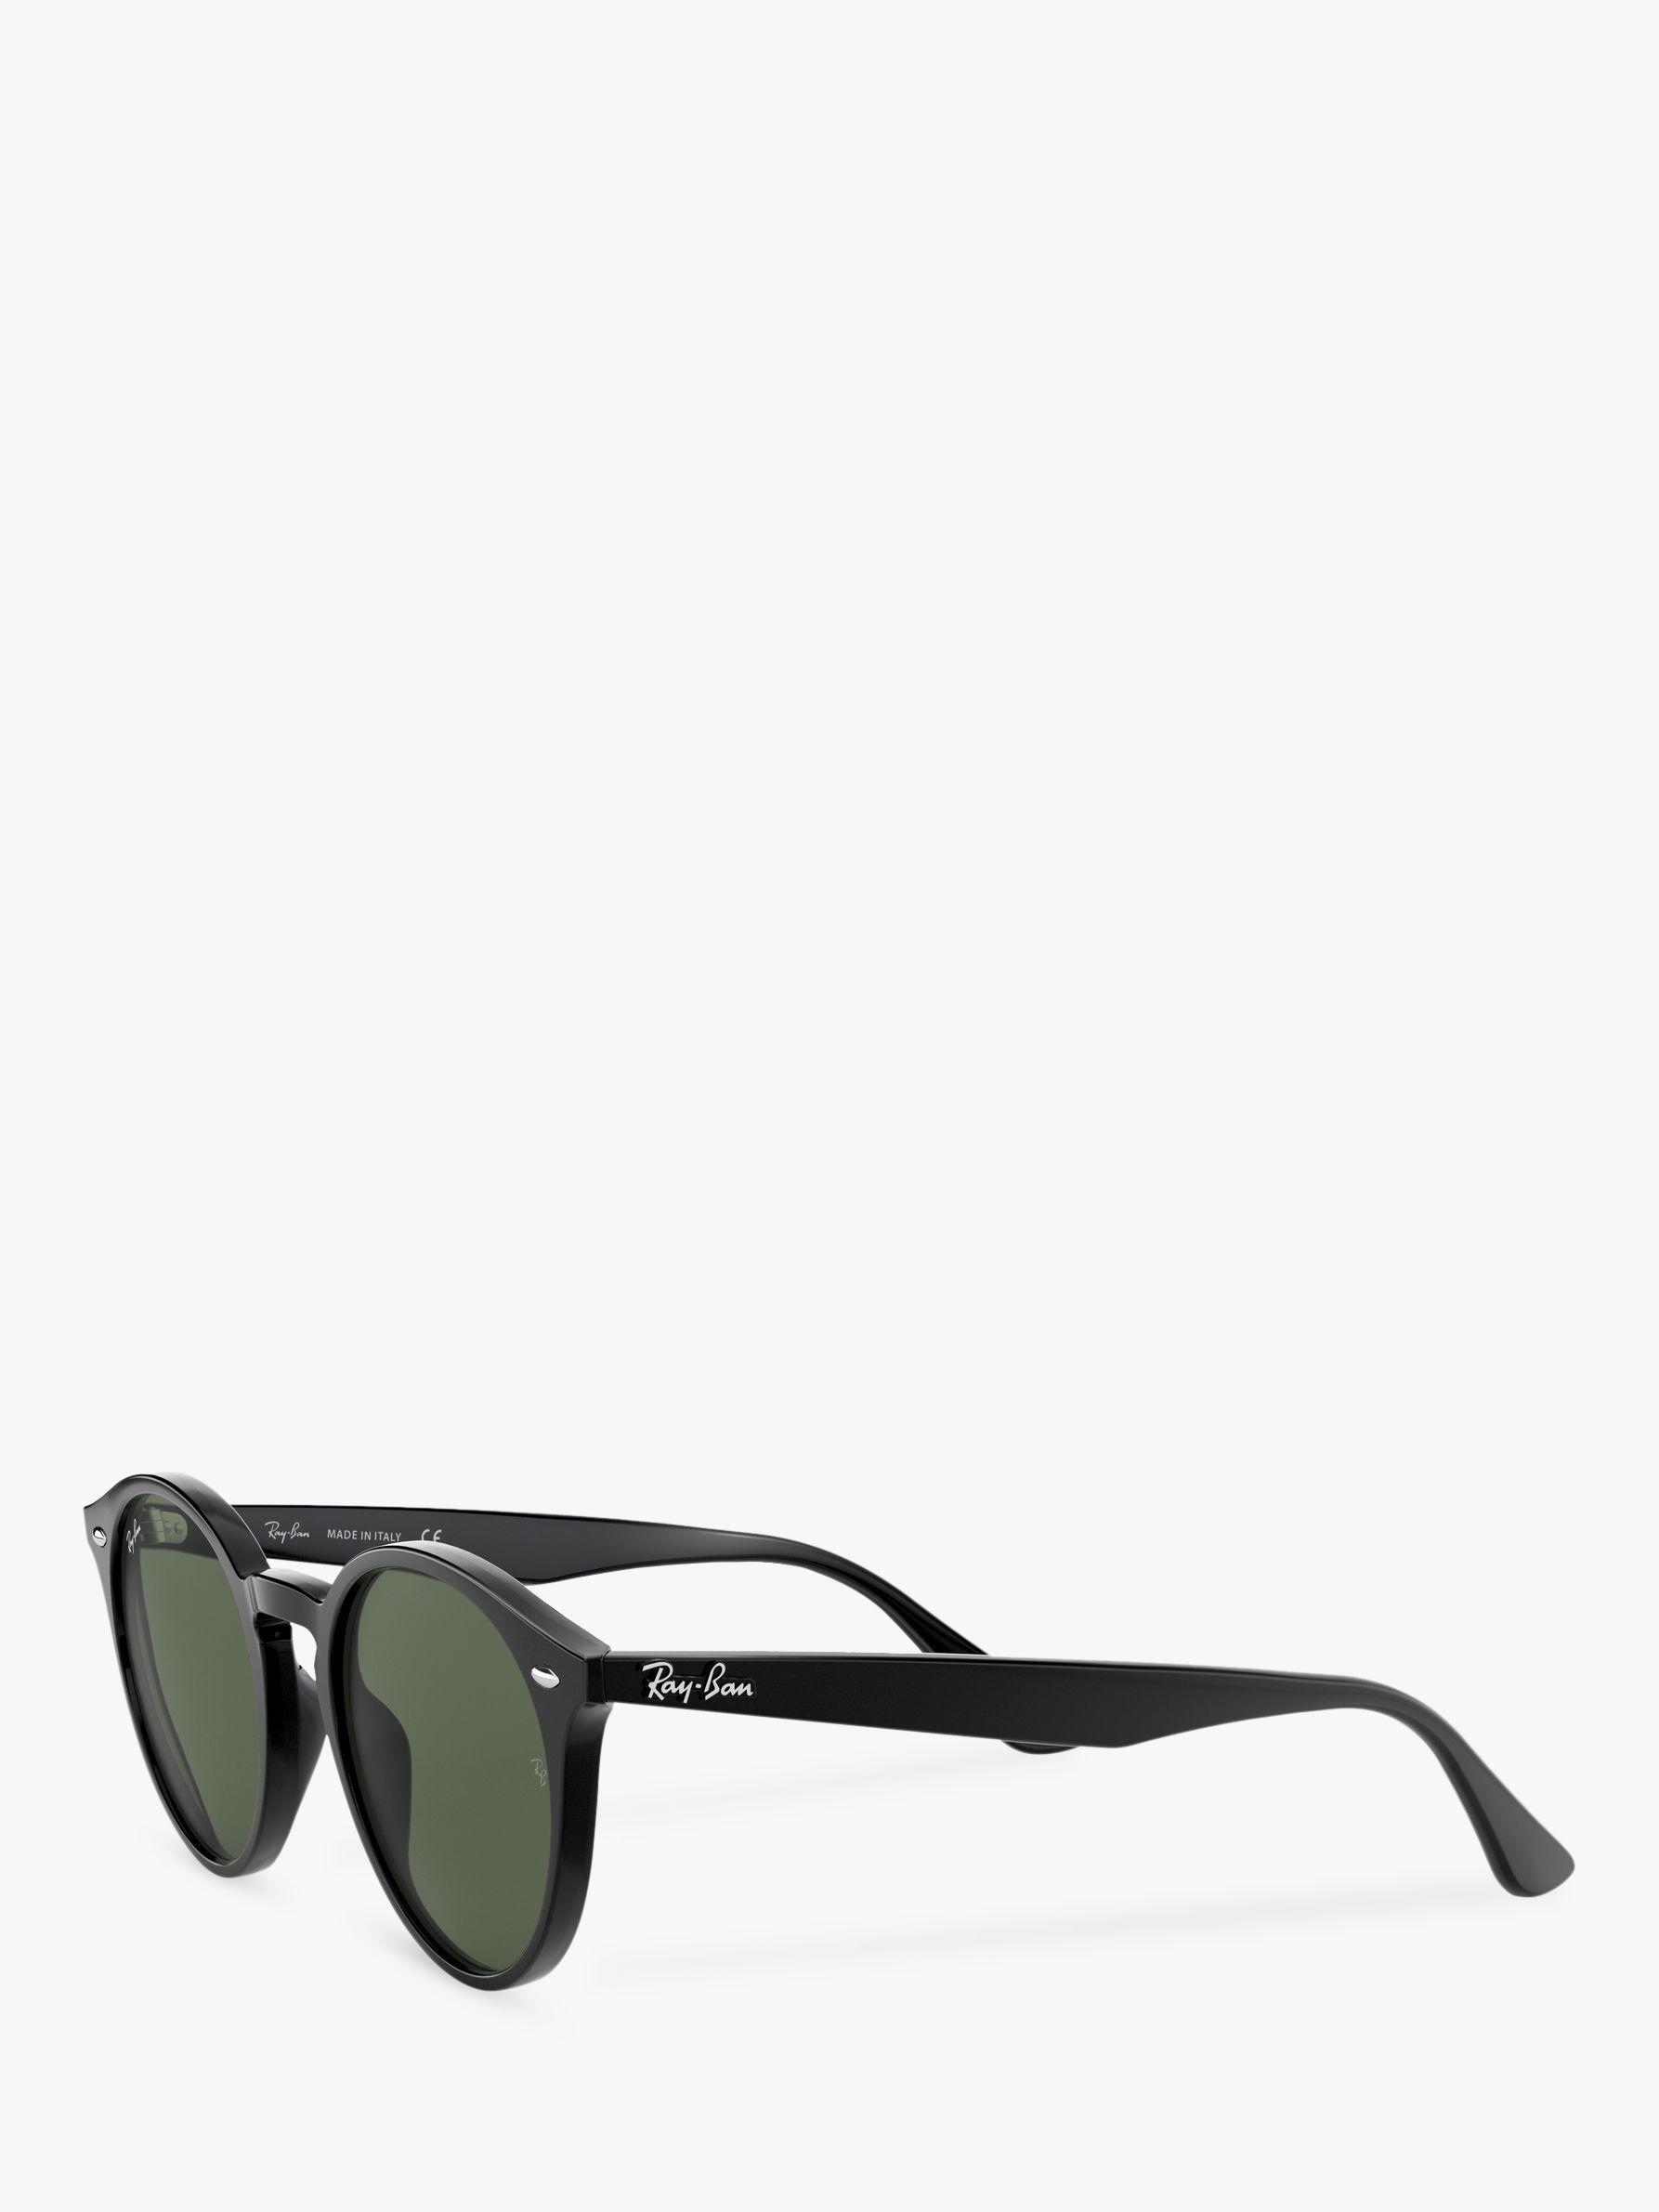 0977e15a91 Ray-Ban Rb2180 Men s Round Framed Sunglasses in Black for Men - Lyst